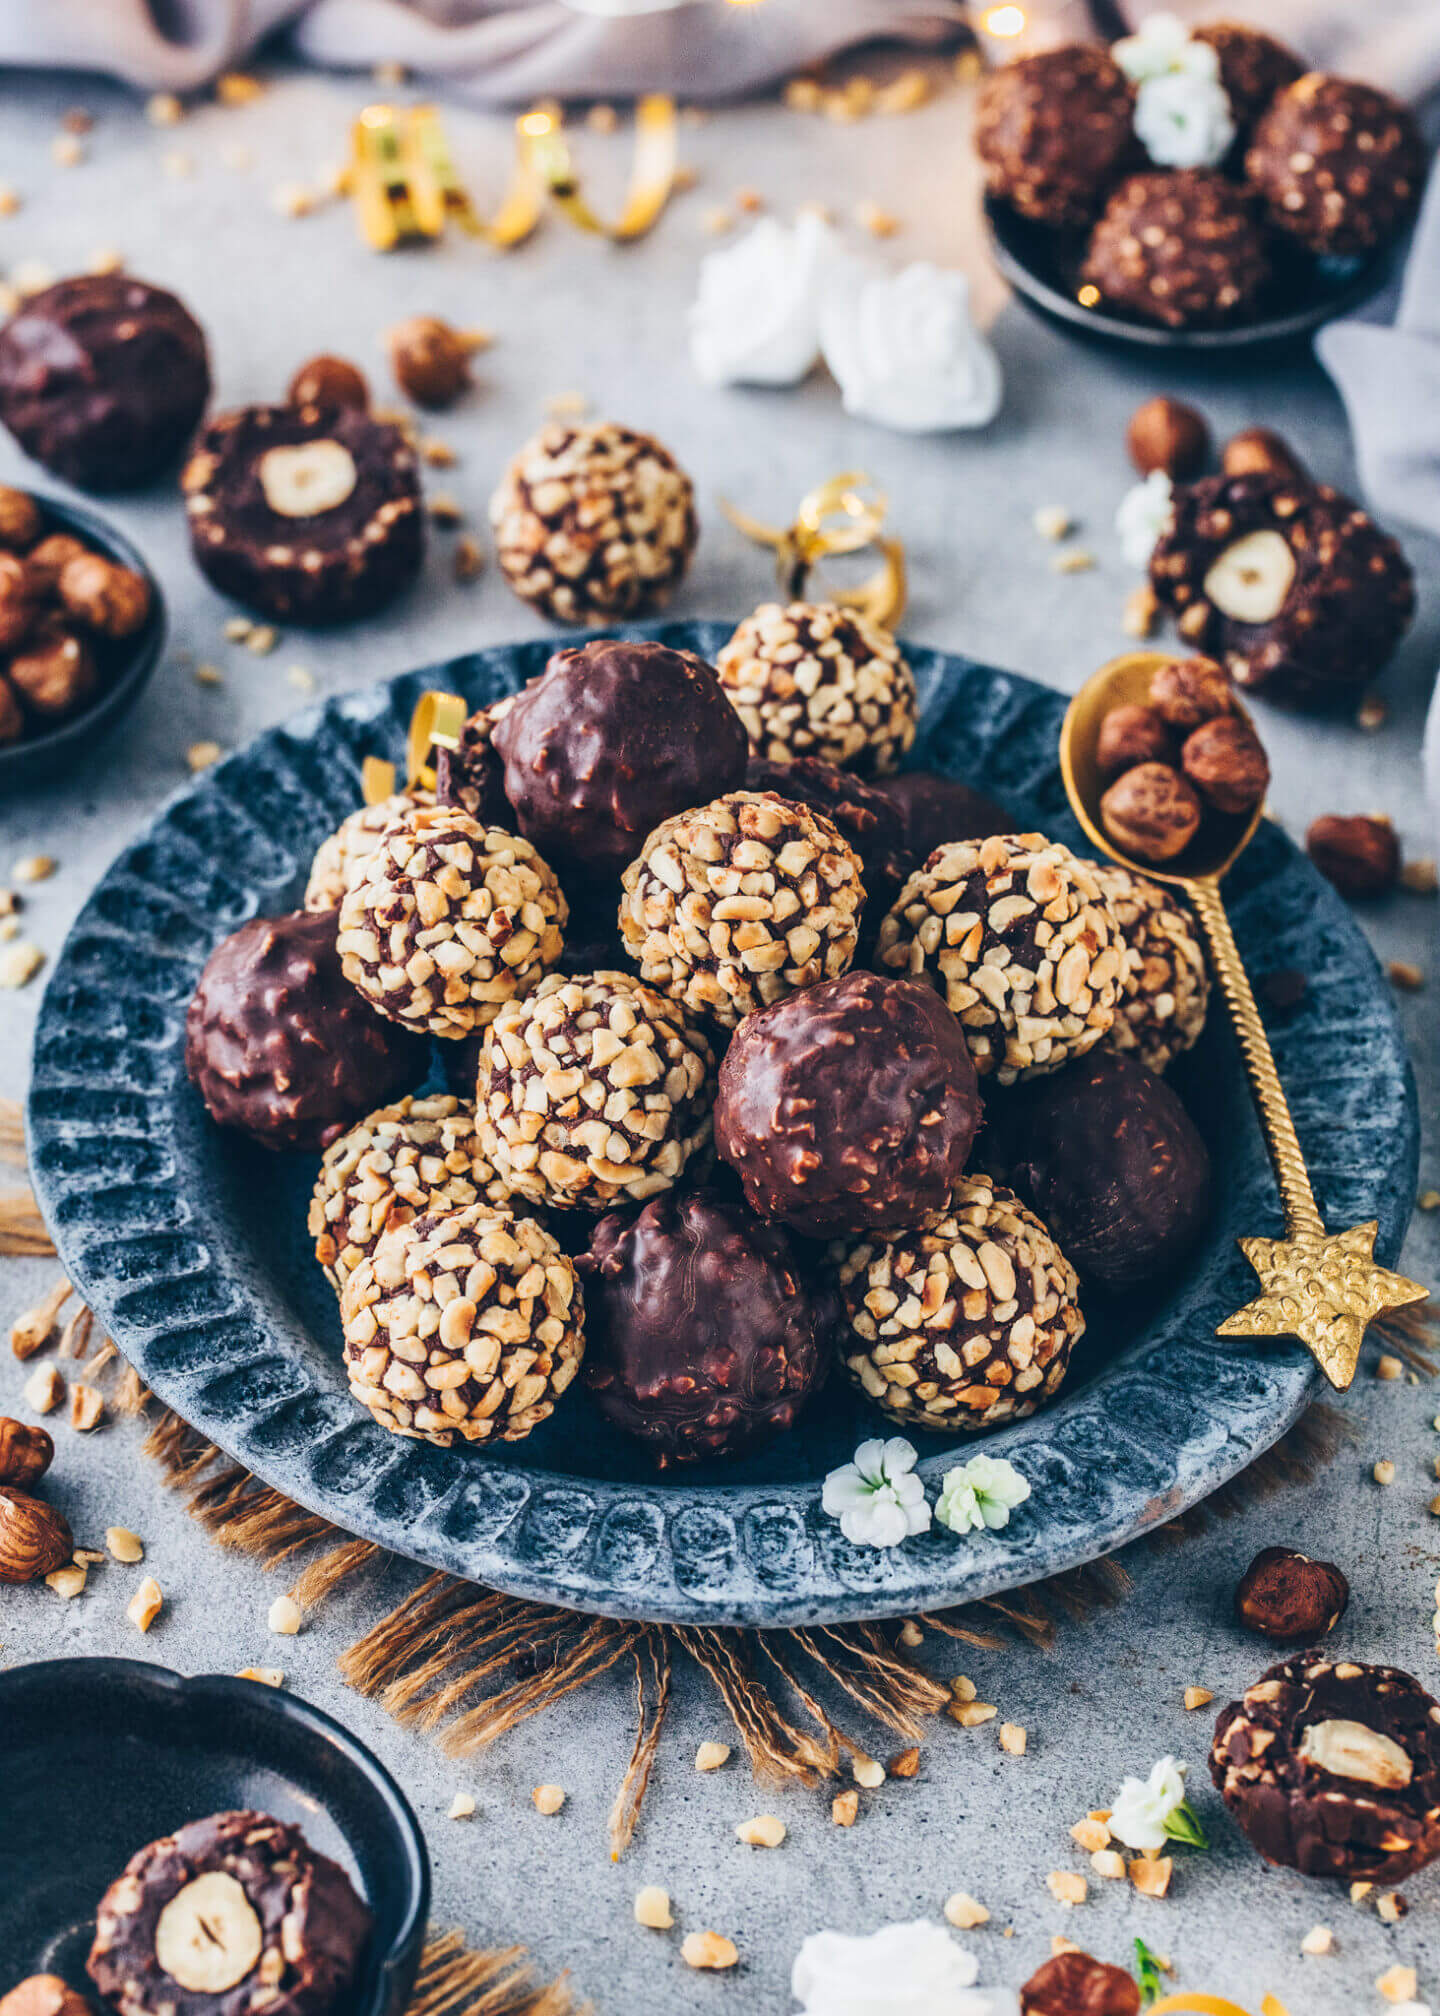 Homemade Ferrero Rocher - Chocolate Hazelnut Truffles